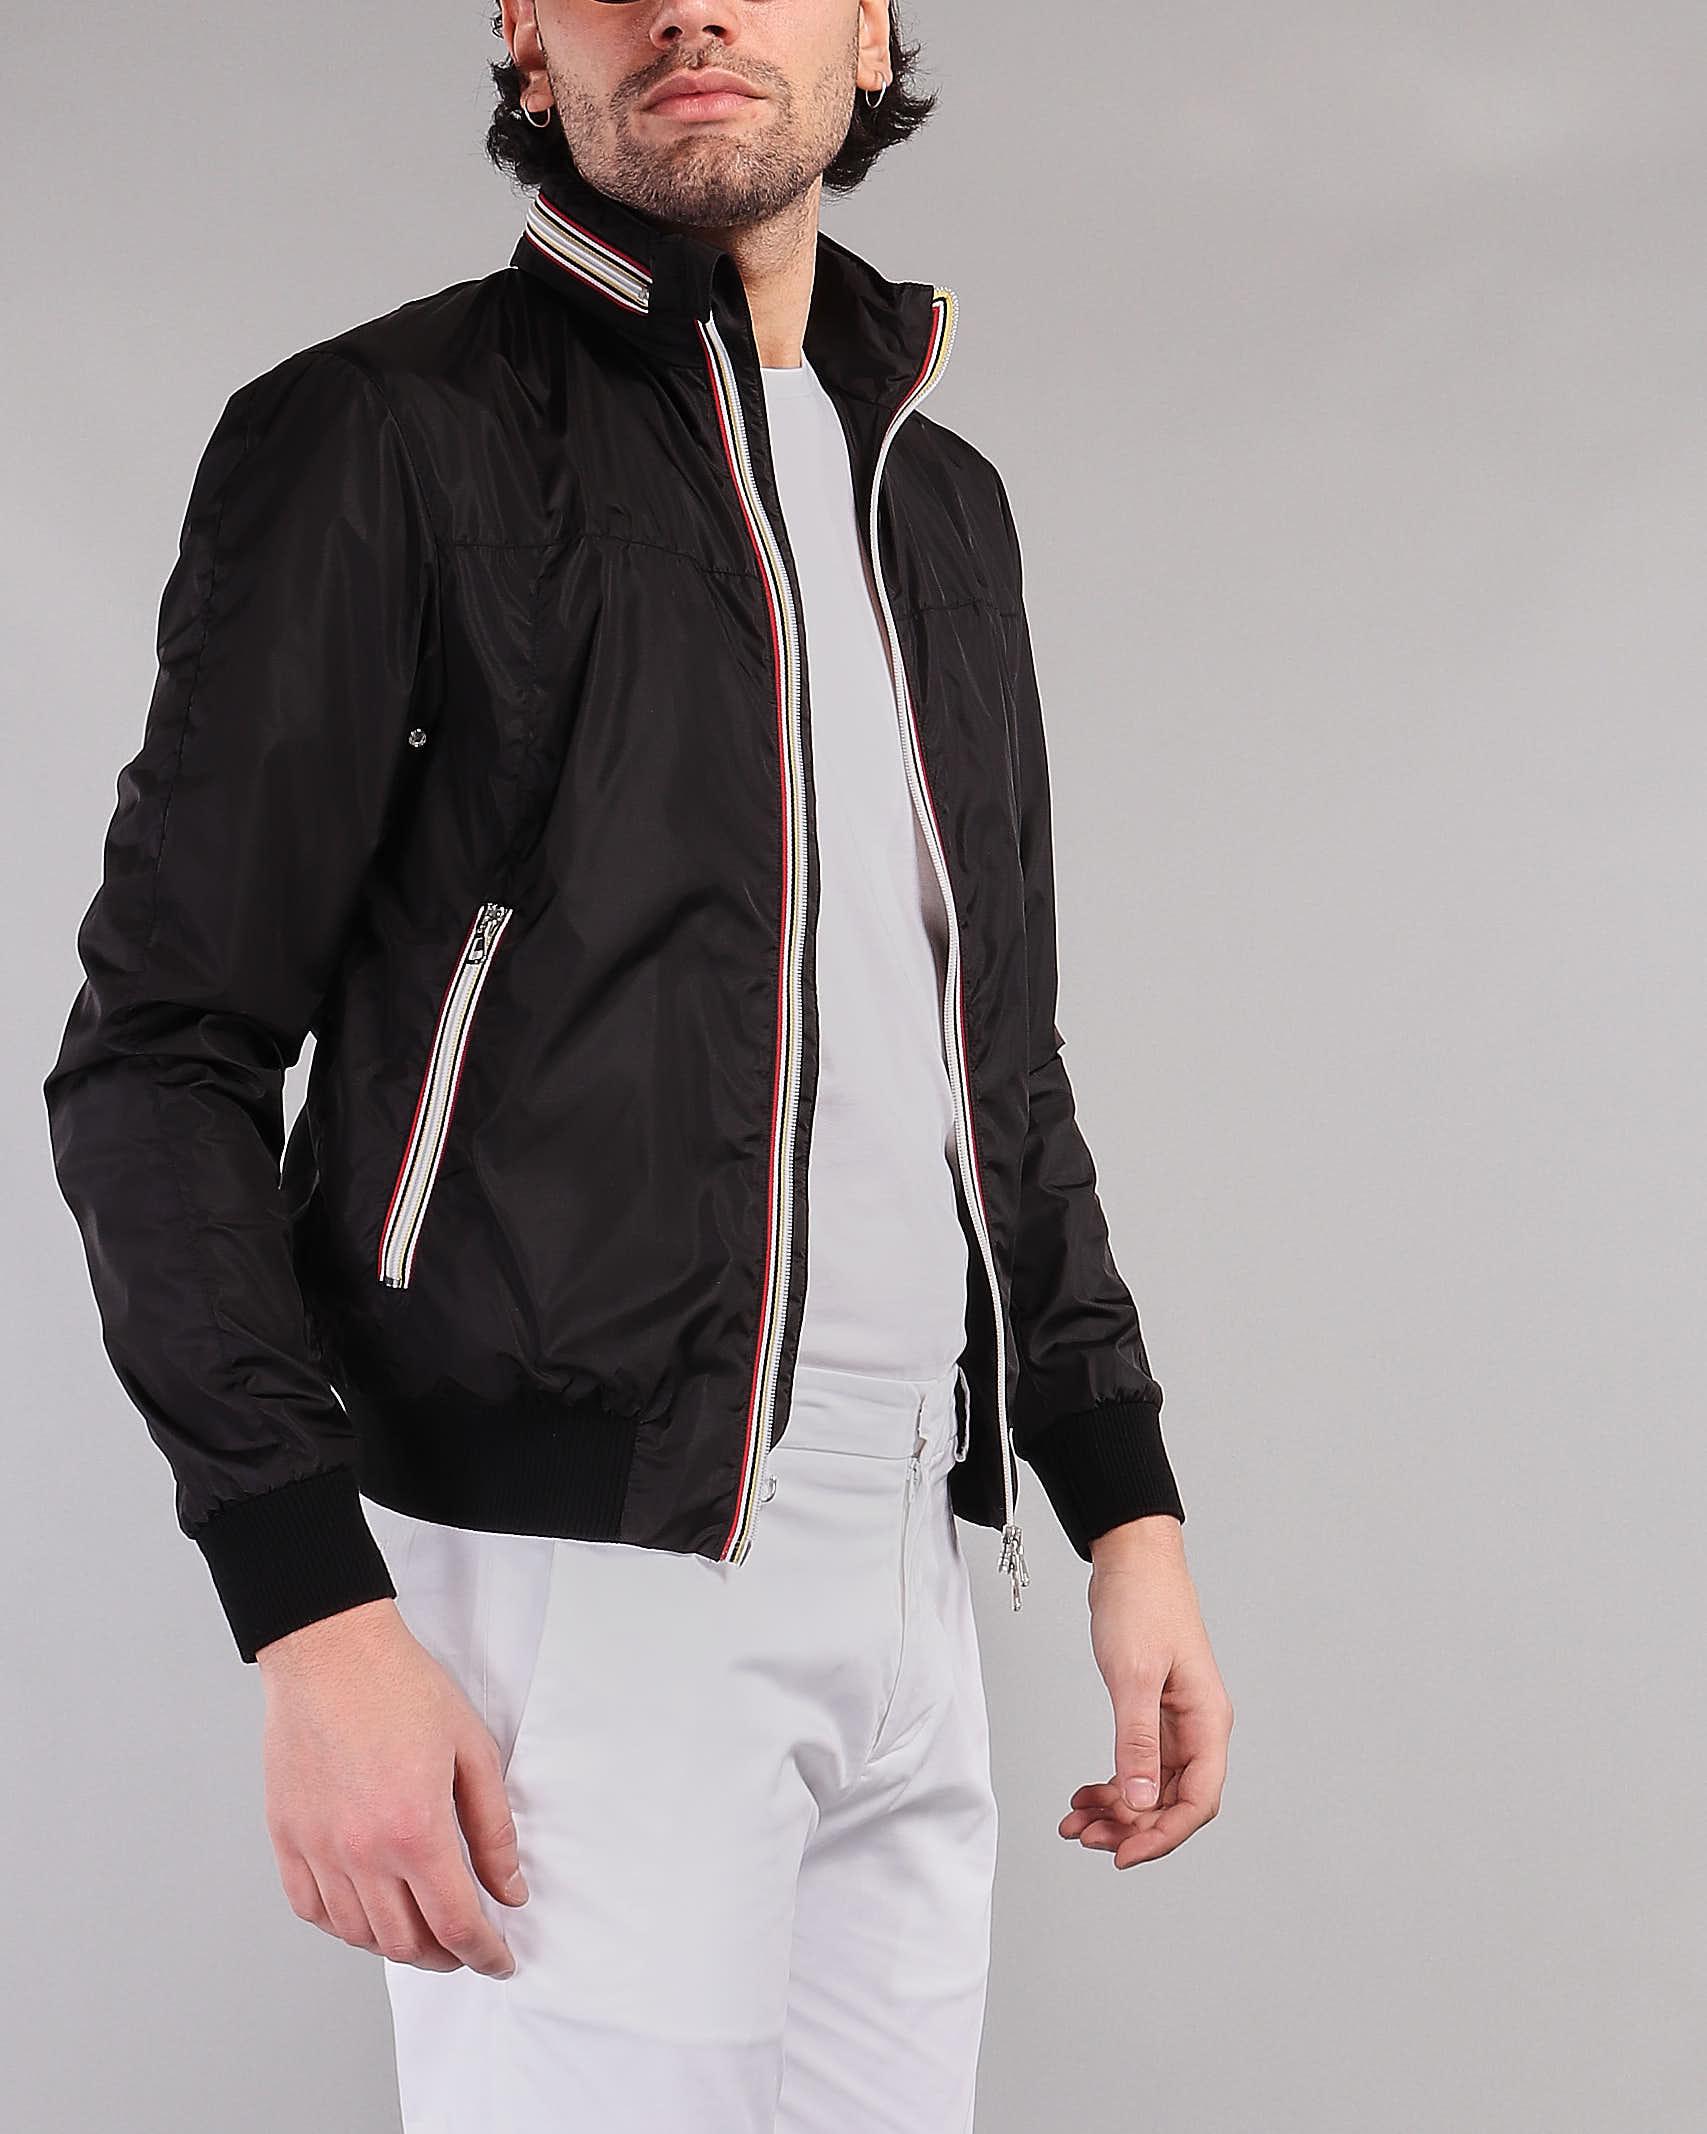 Giubbotto con zip colorata Low Brand LOW BRAND | Giubbotto | L1JSS215858D001